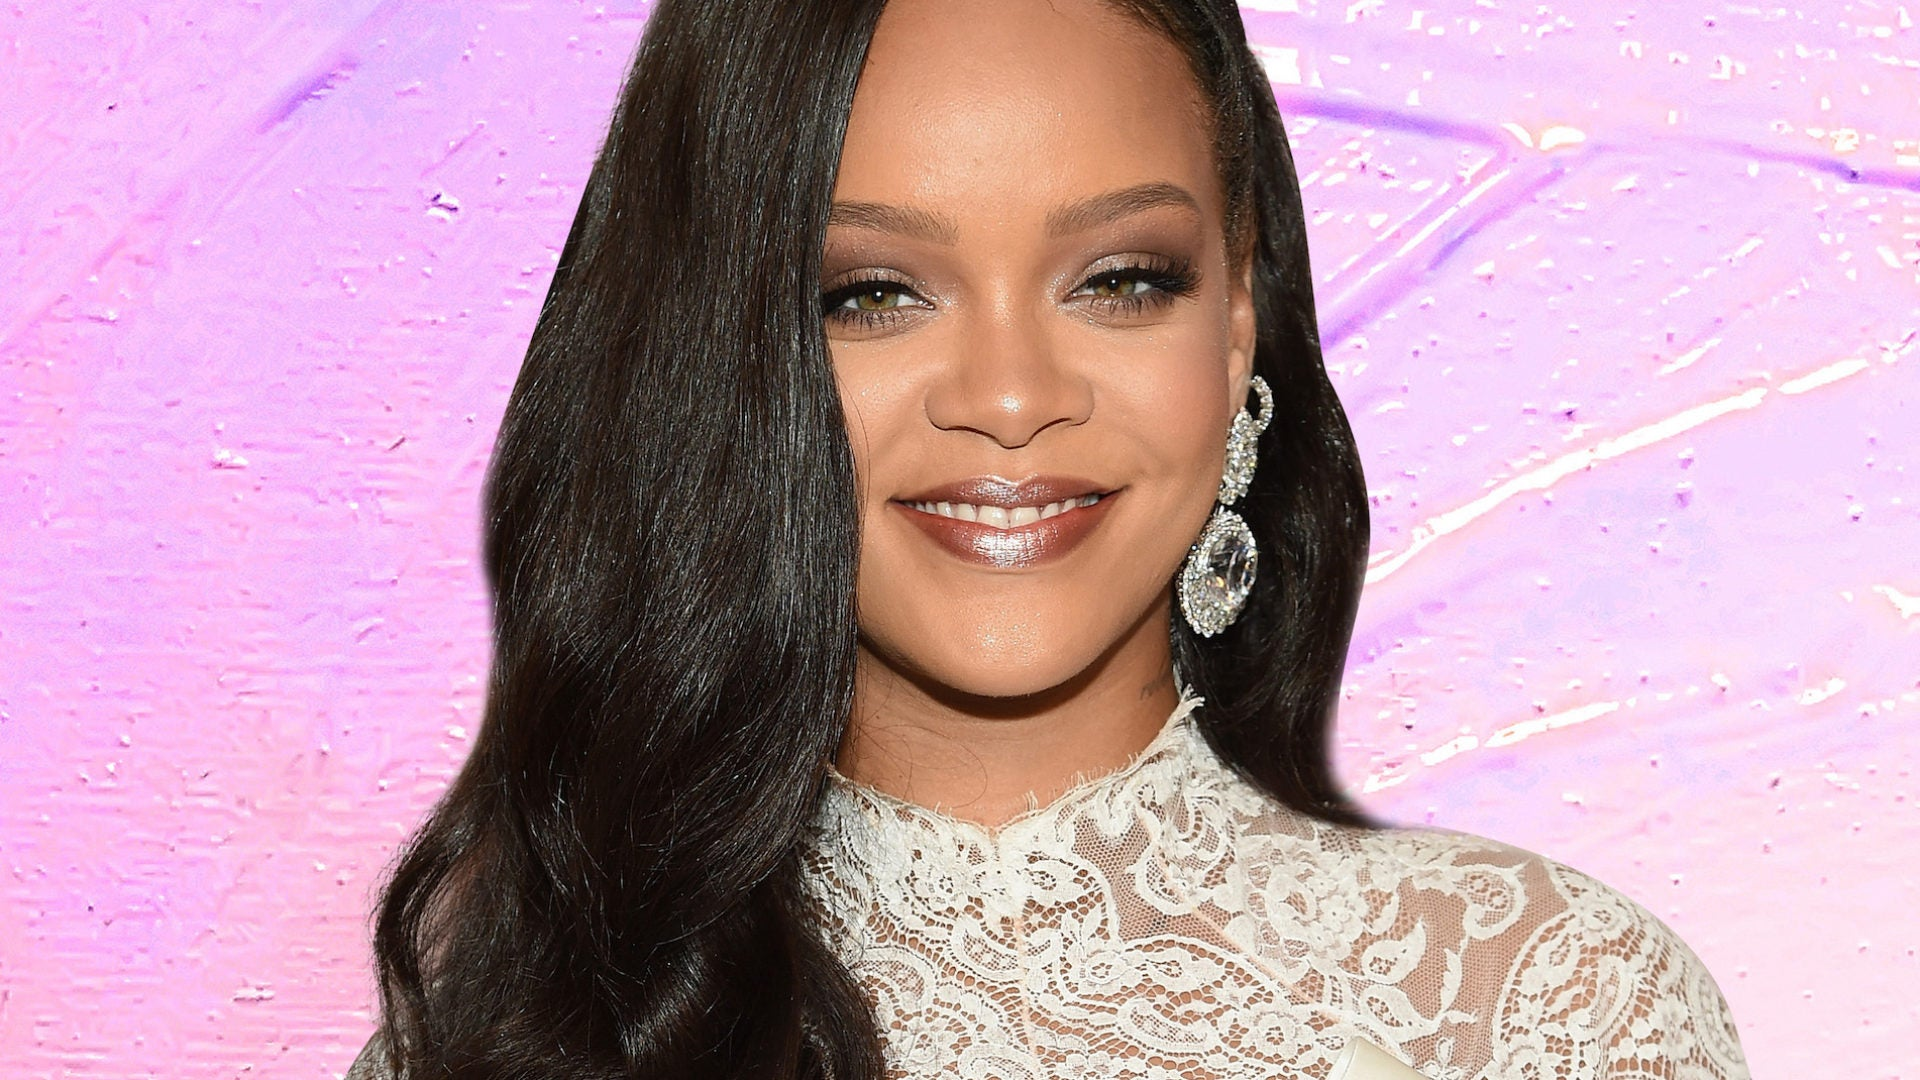 Rihanna's Lavender Jade Nails Will Make You Want To Realign Your Chakras